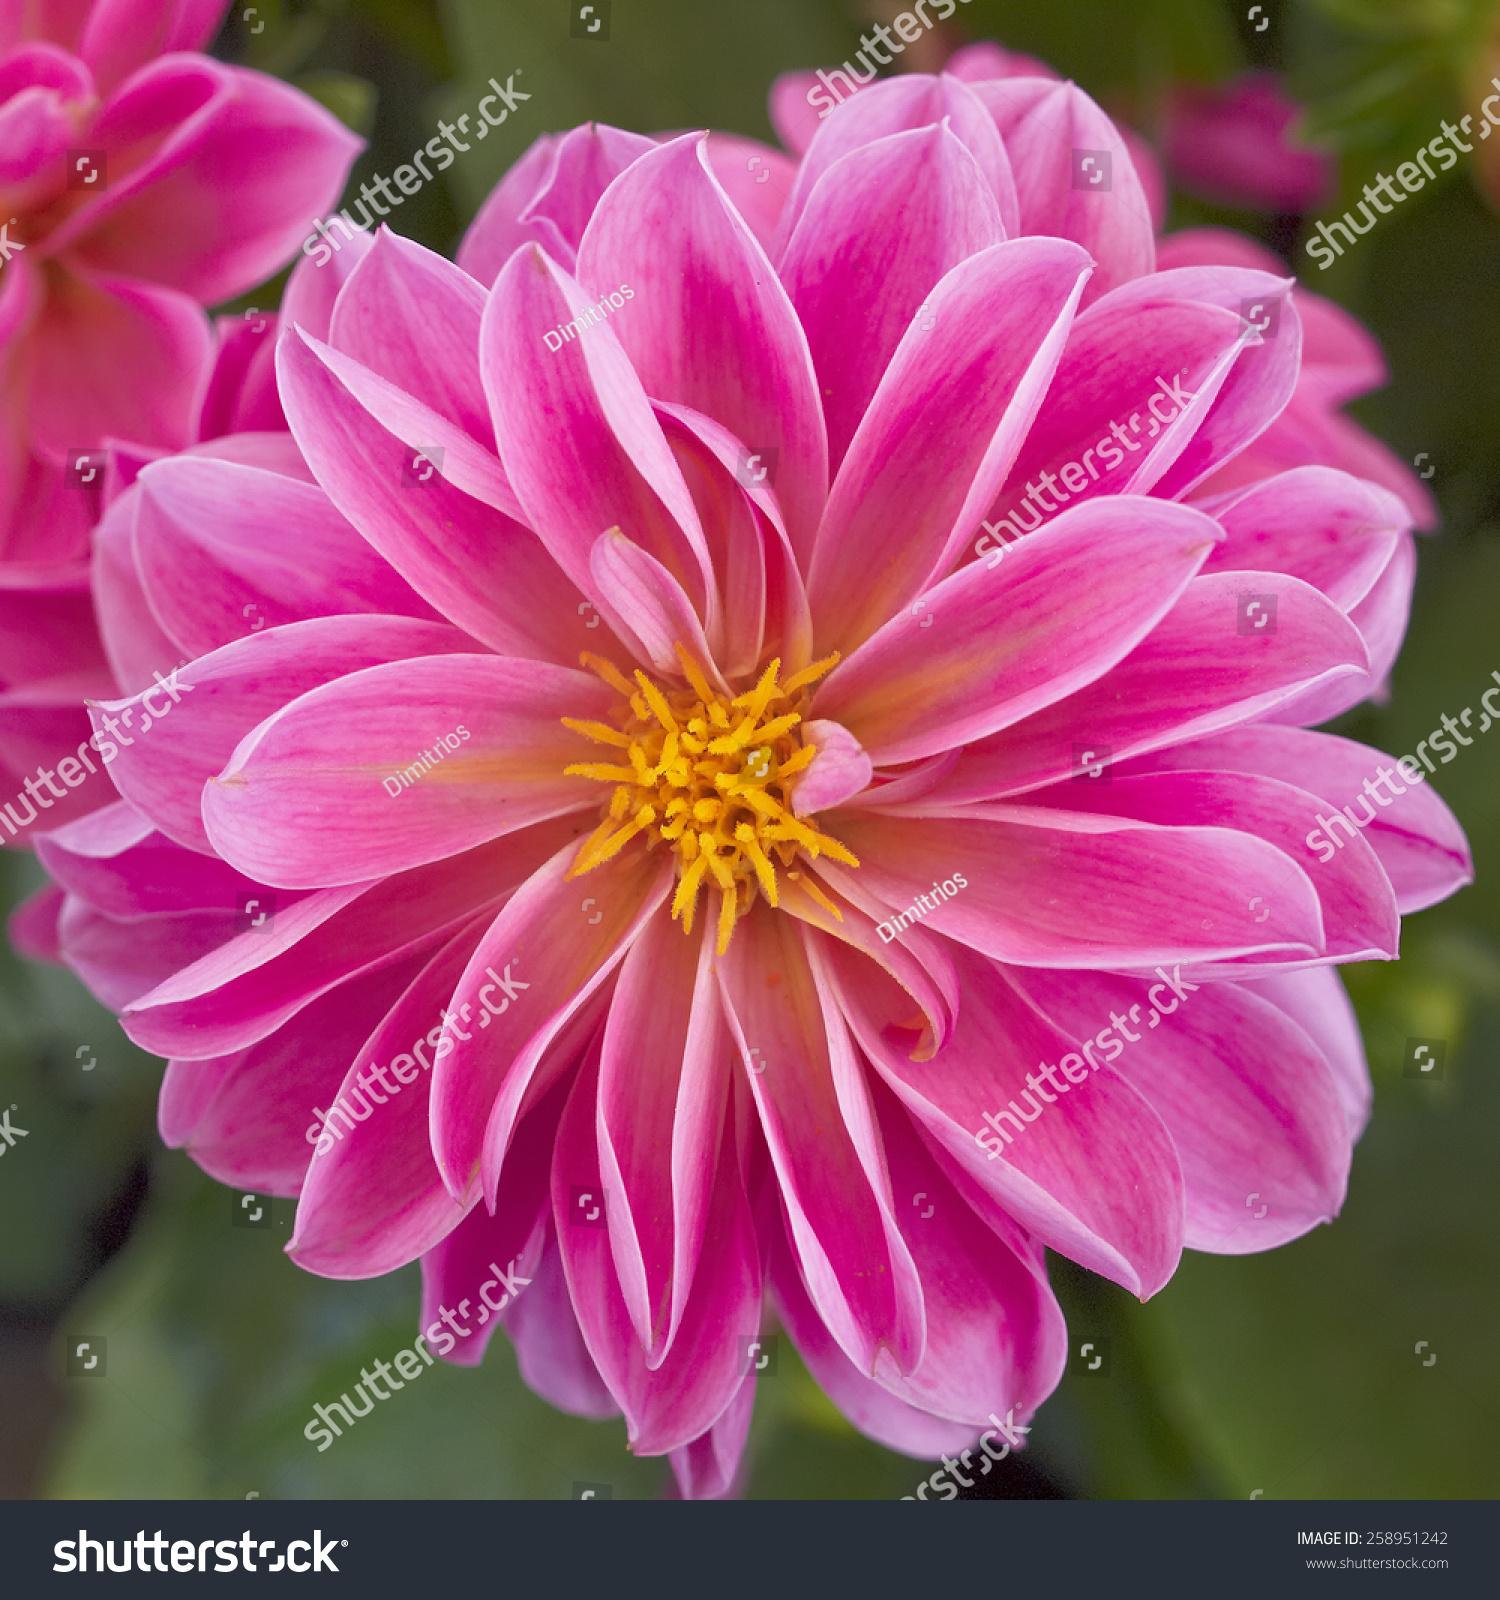 Pink dahlia flower closeup natural background ez canvas id 258951242 izmirmasajfo